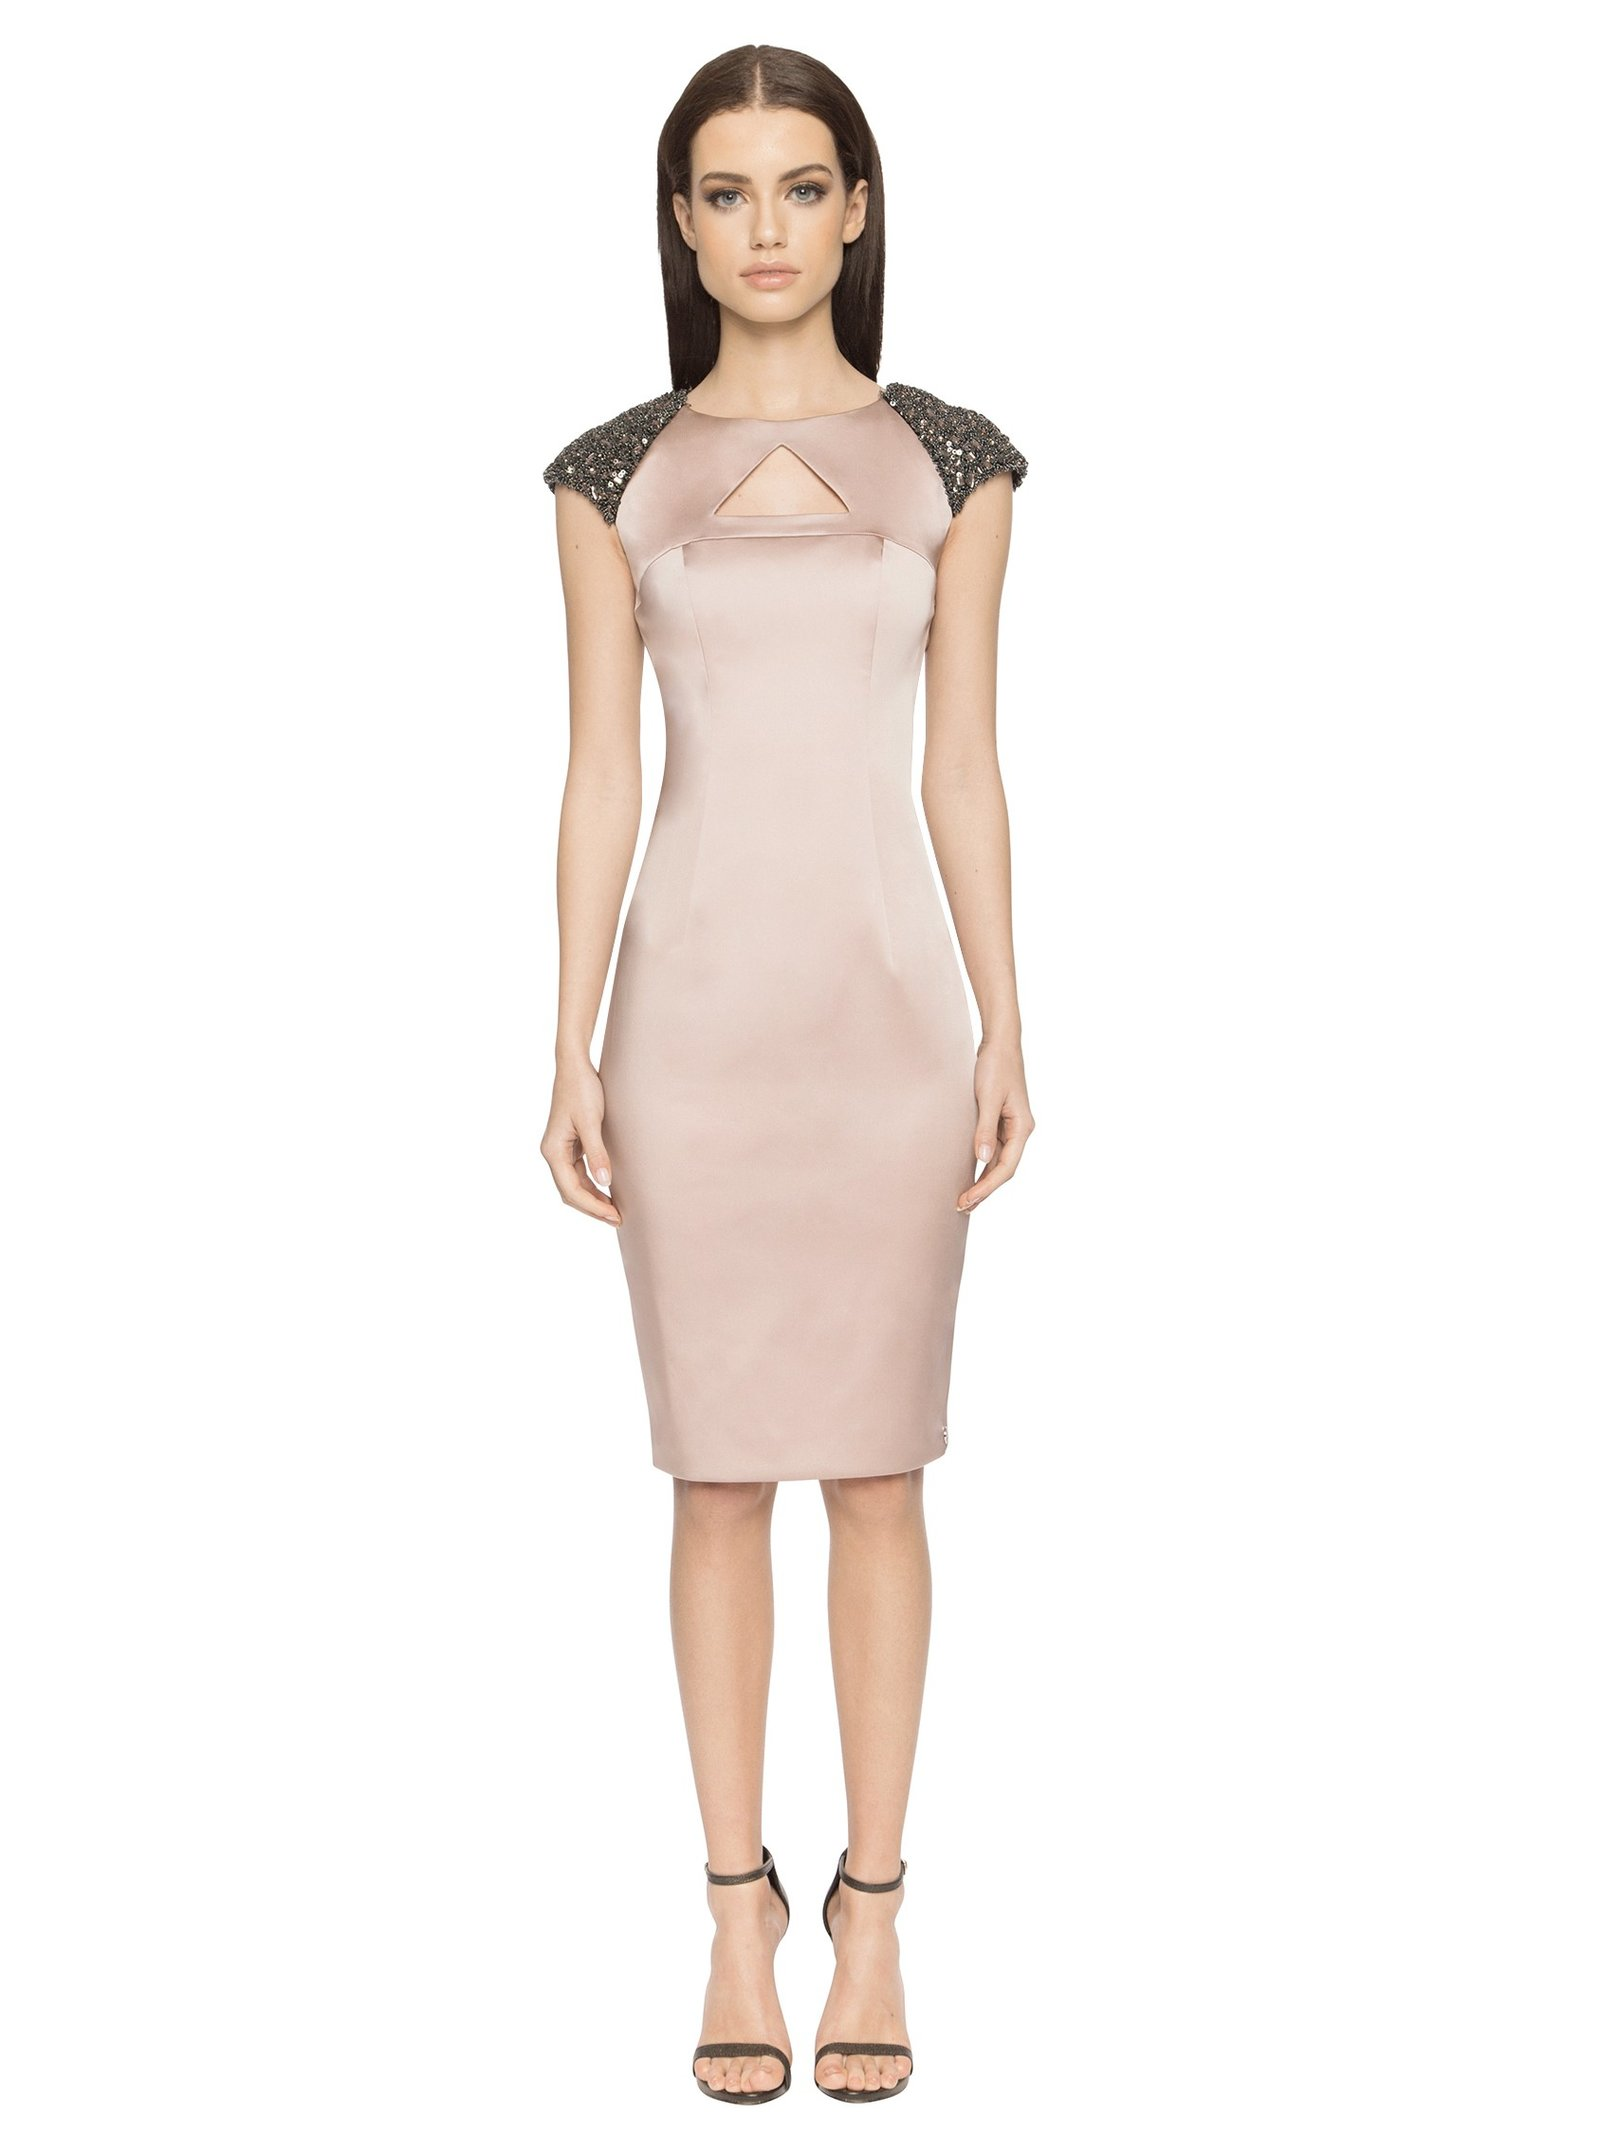 Aloura London Arlington Dress - Dusty Pink